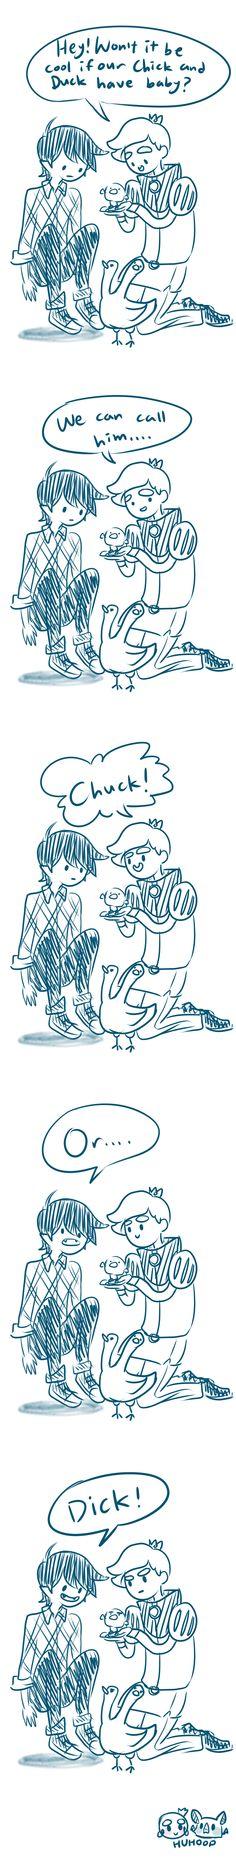 Chick and Duck by Huhoop.deviantart.com on @deviantART